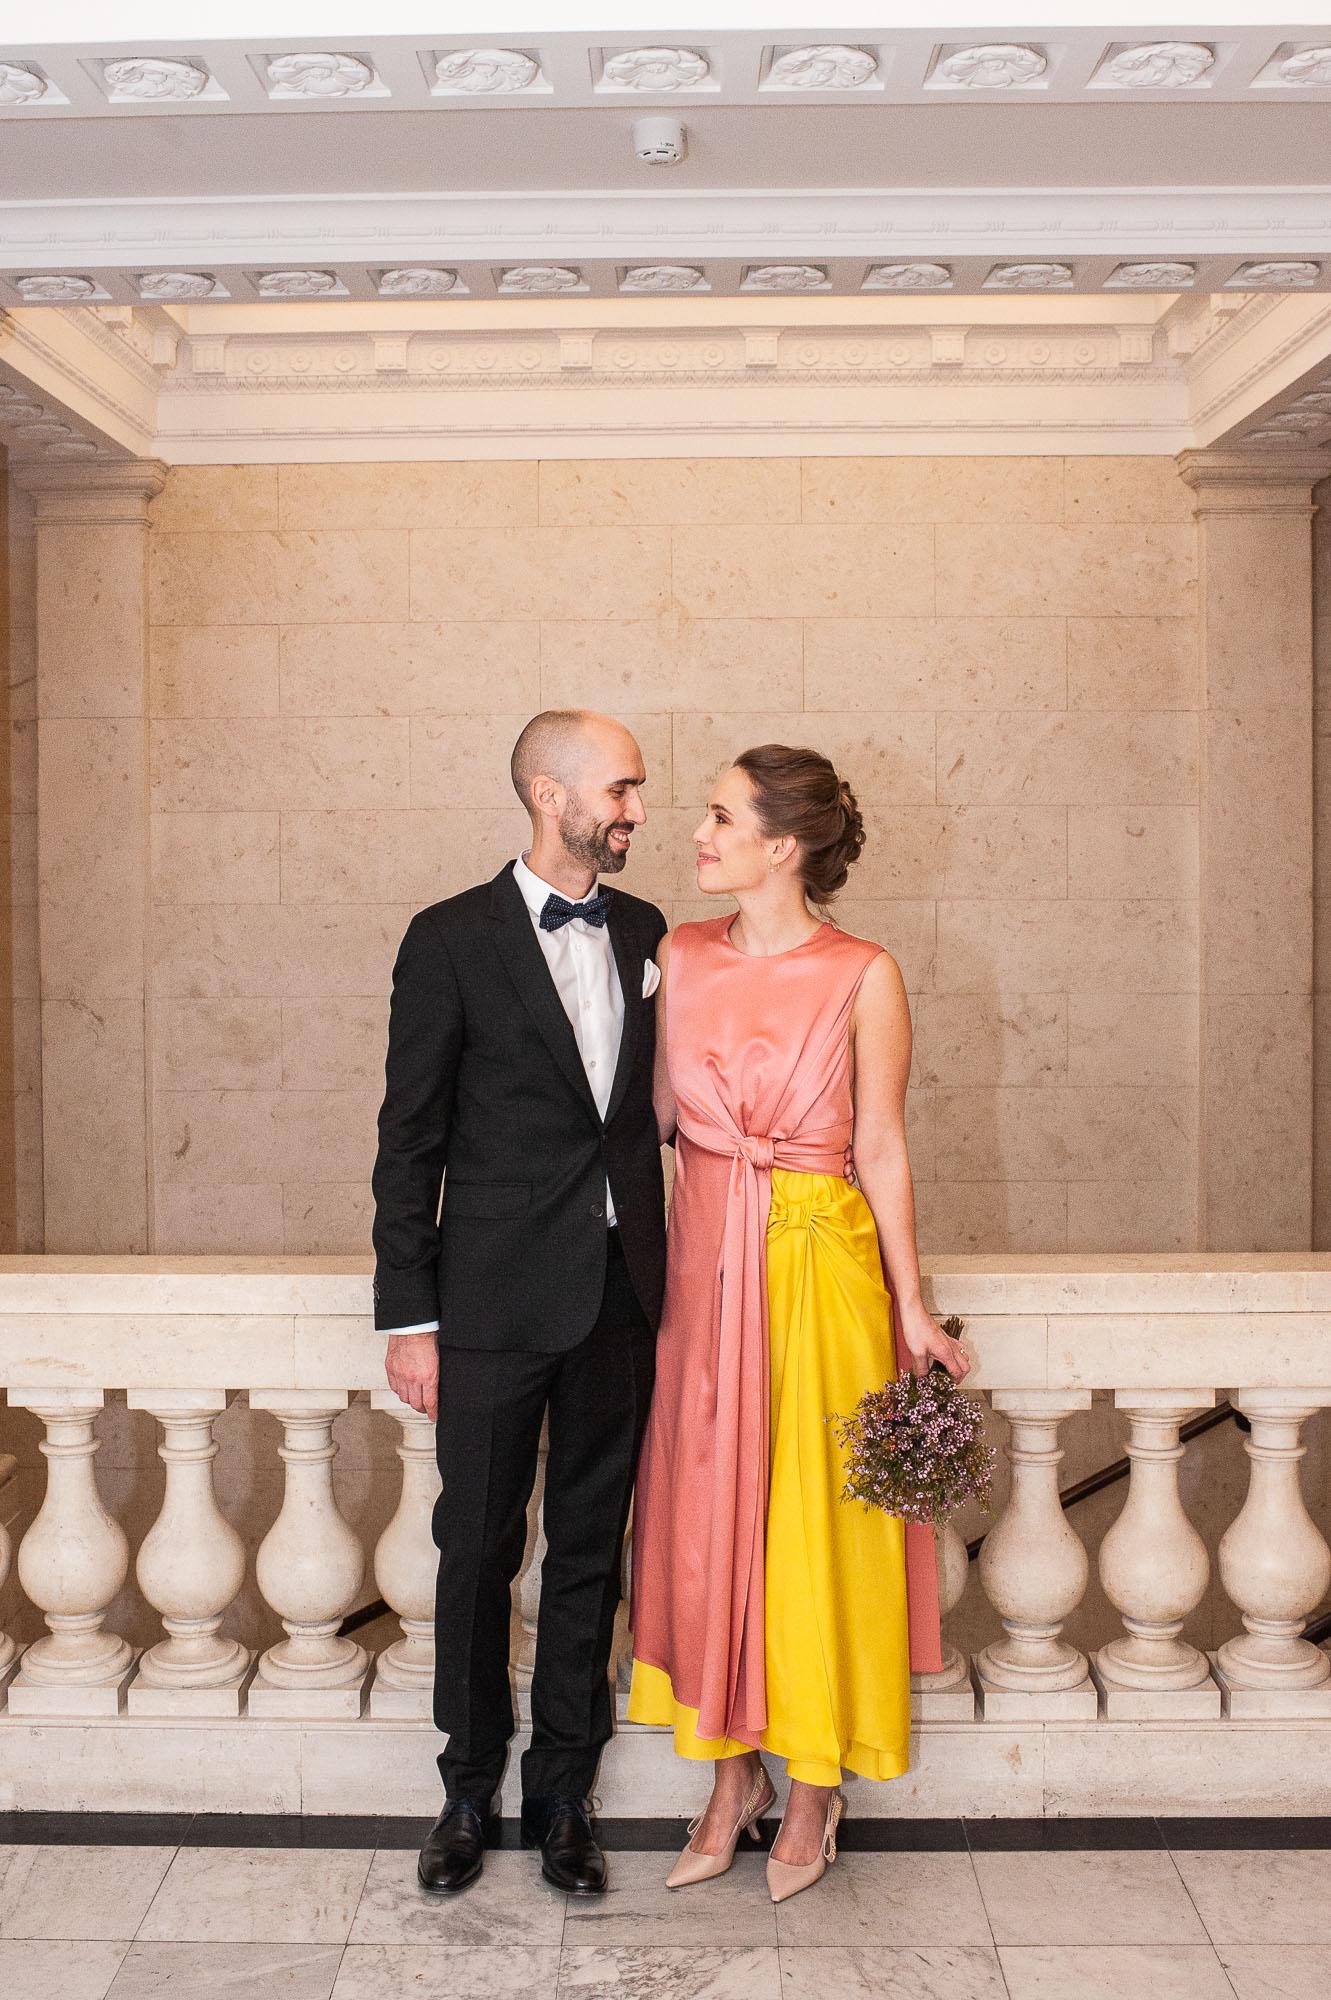 Our Wedding_HR (49 of 176).jpg